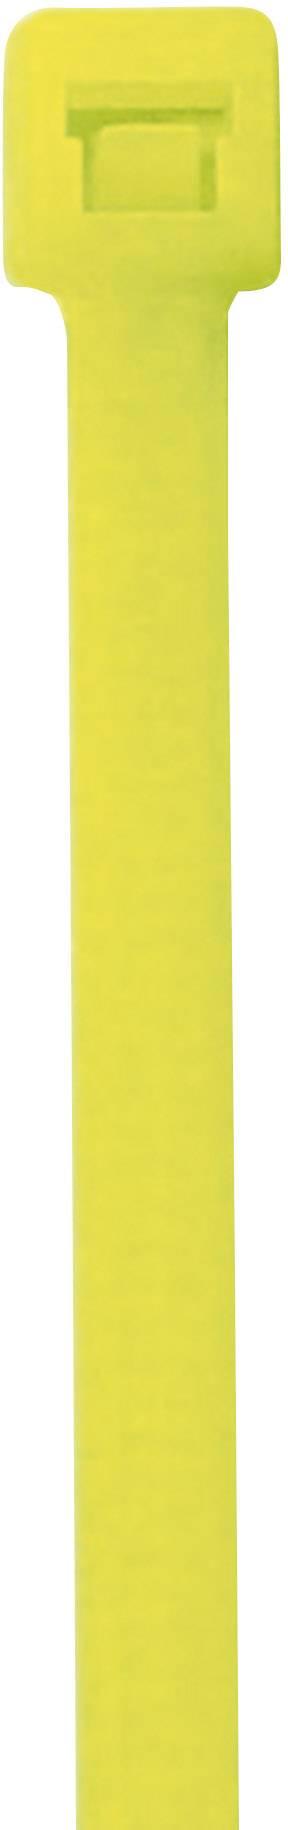 Neonska kabelska vezica, fluorescenčna (D x Š) 192 mm x 4.6 mm rumena, 50 kosov, PB Fastener